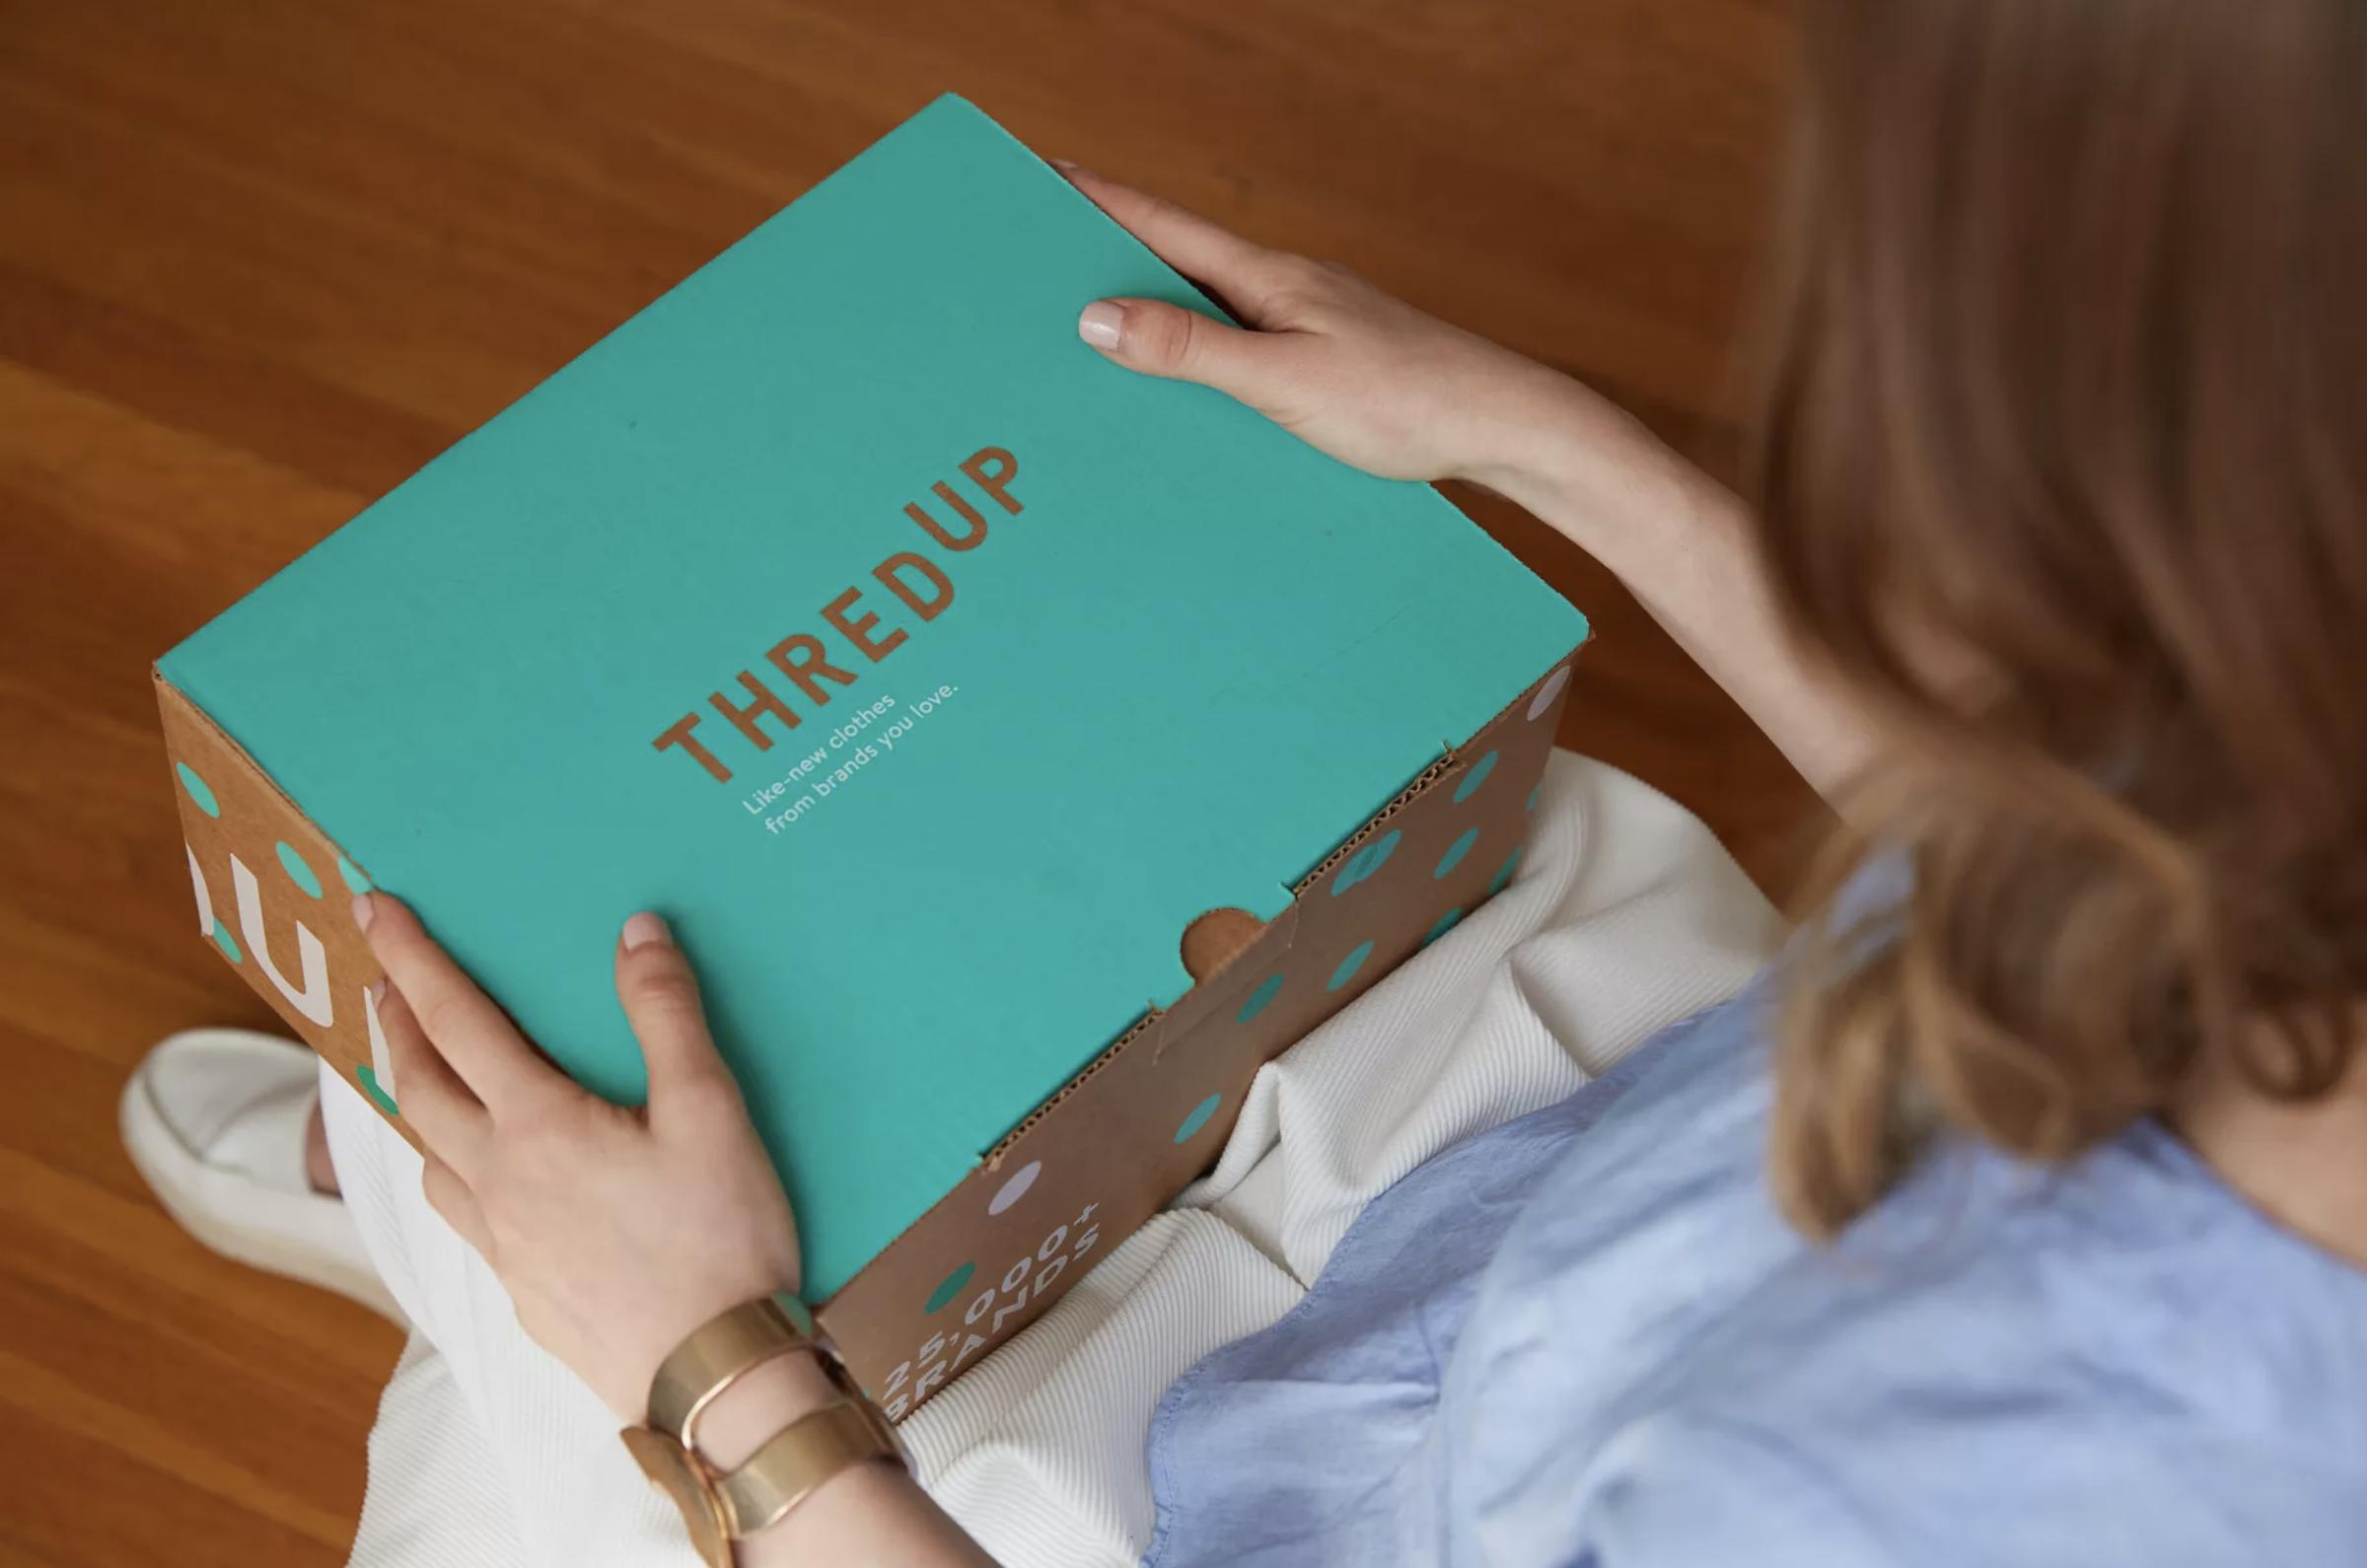 "<a href=""https://www.thredup.com/goody"">ThredUp Goody Boxes</a>"